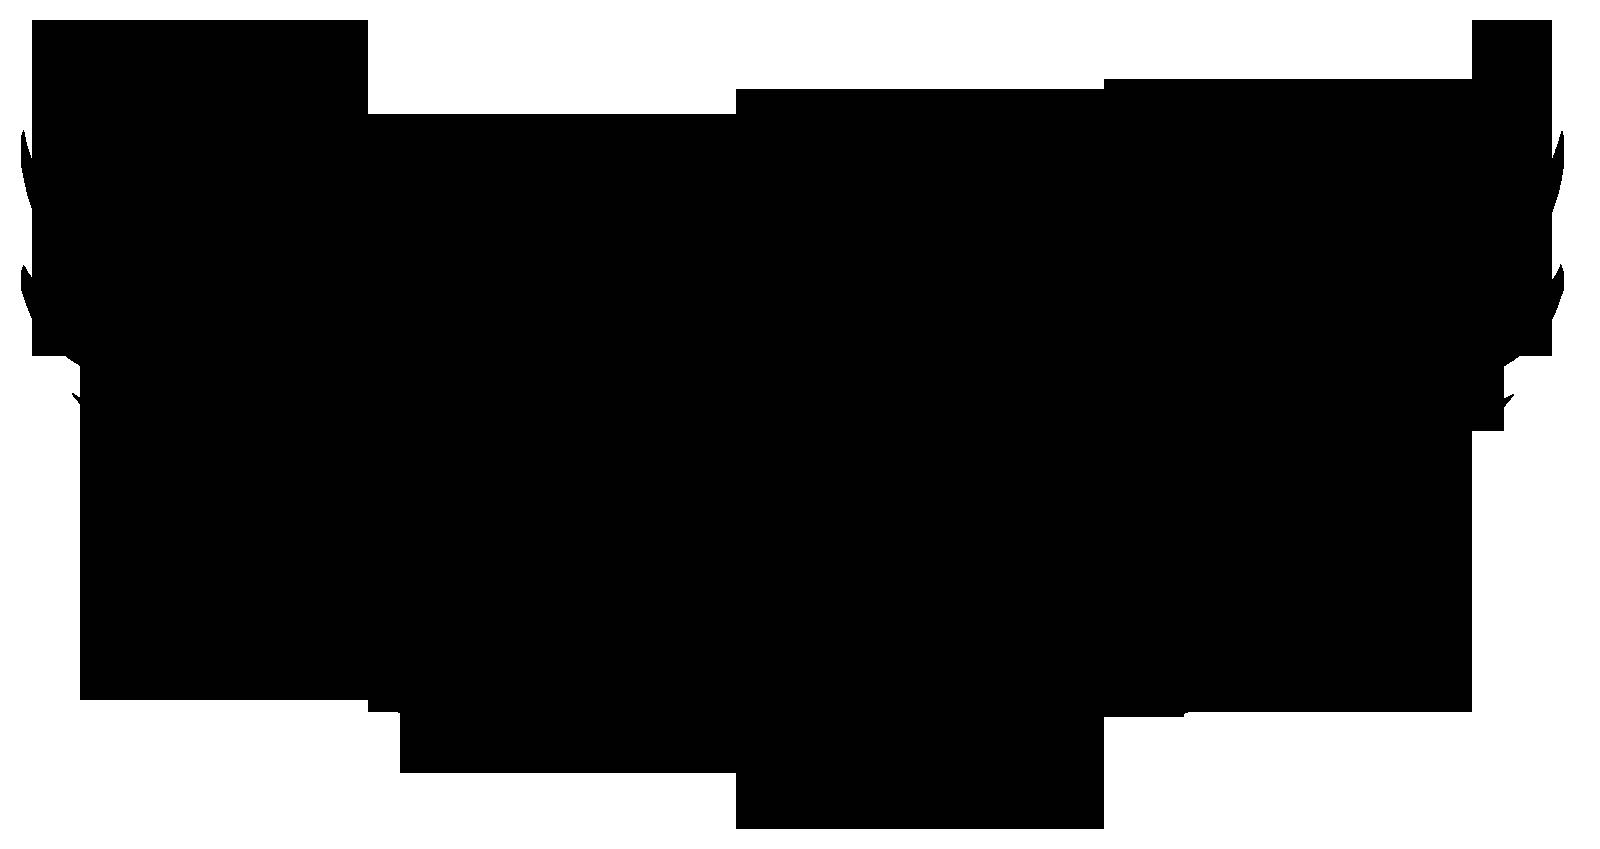 PB LOGO BLACK PNG